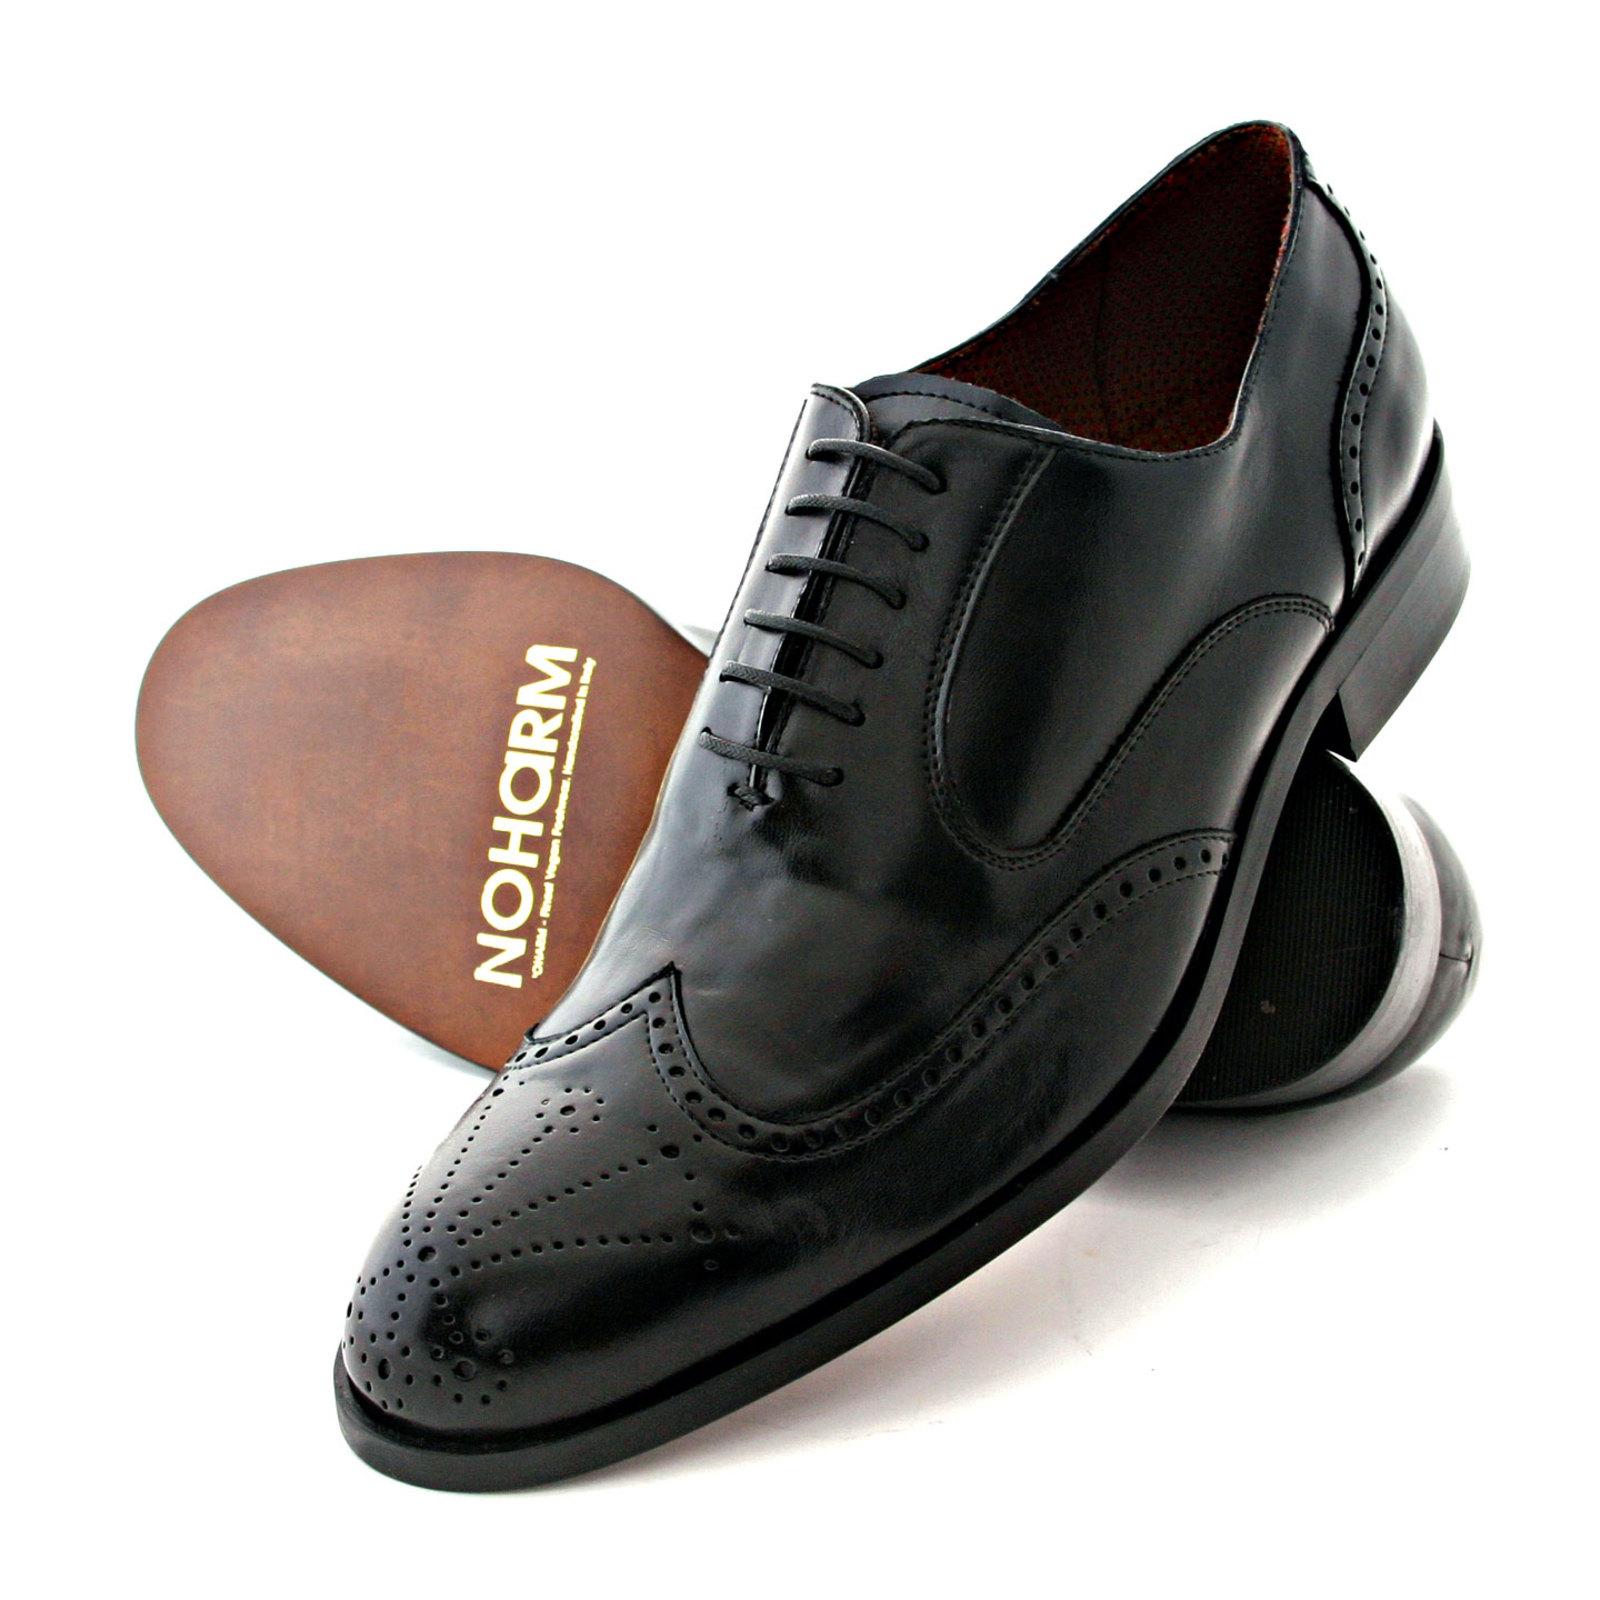 Clarks Fair Trade Shoes